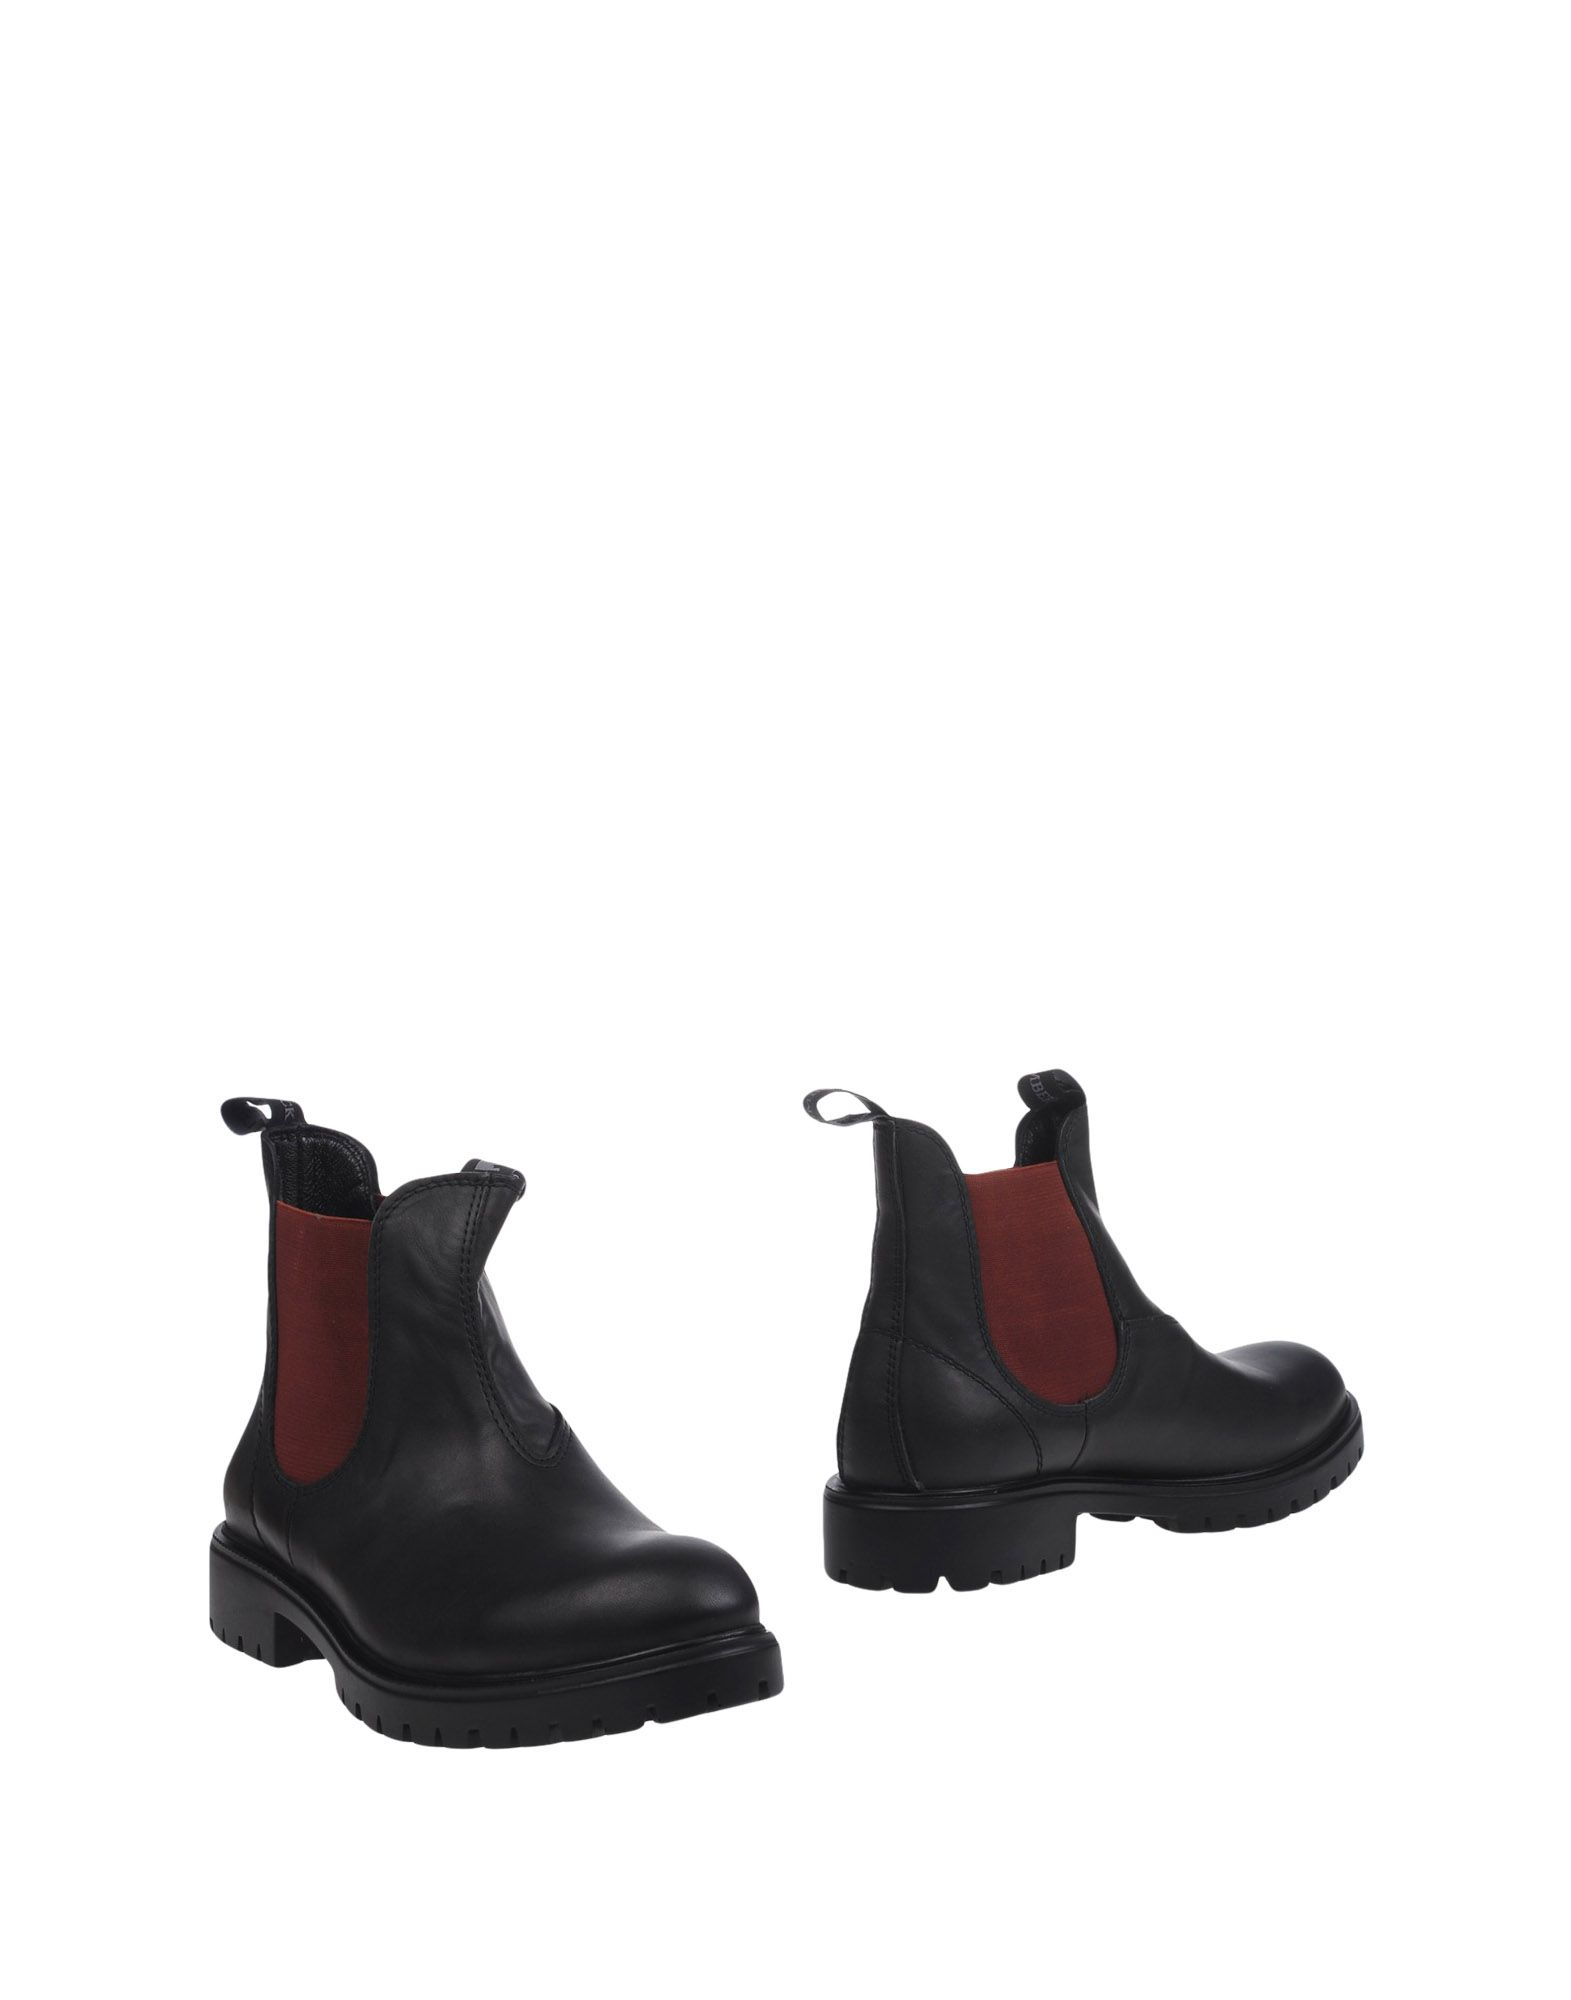 LUMBERJACK Полусапоги и высокие ботинки 4pcs set compatible ink cartridge epson t0321 t0322 t0323 t0324 for epson stylus c70 c70 c80 c80n c80wn